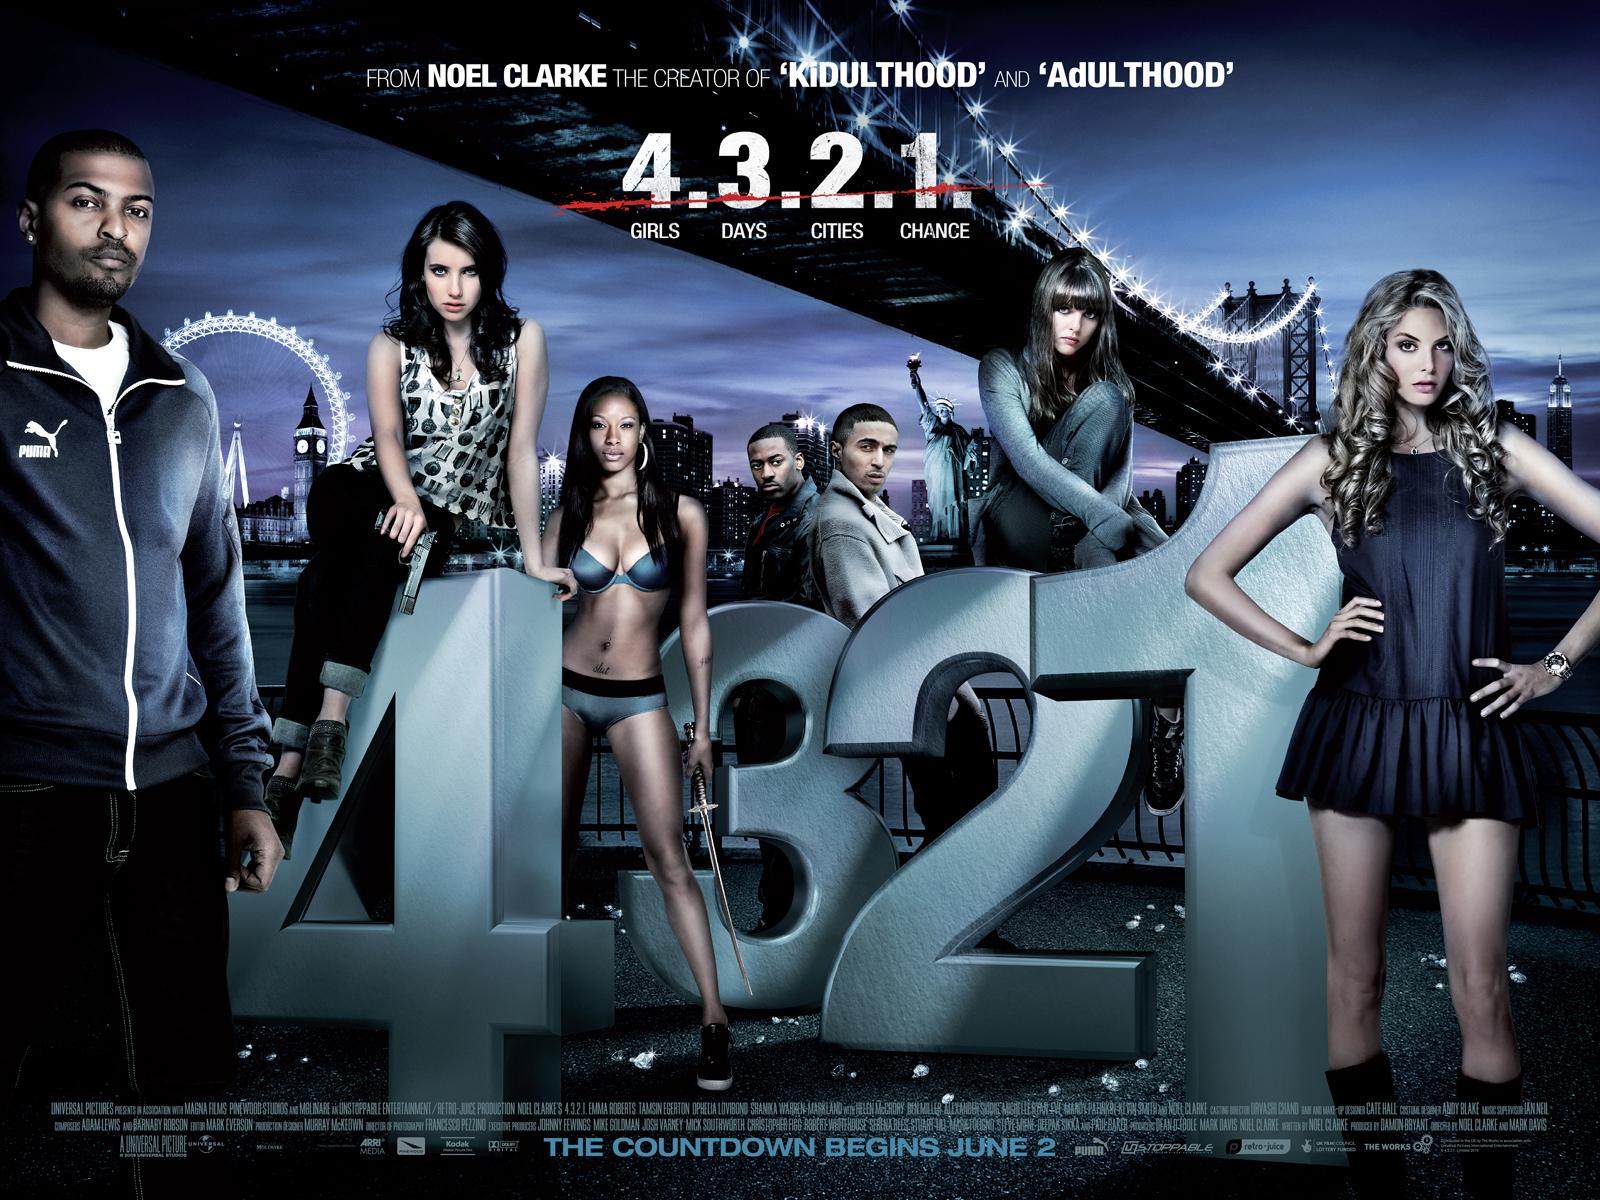 image 4.3.2.1. Watch Full Movie Free Online